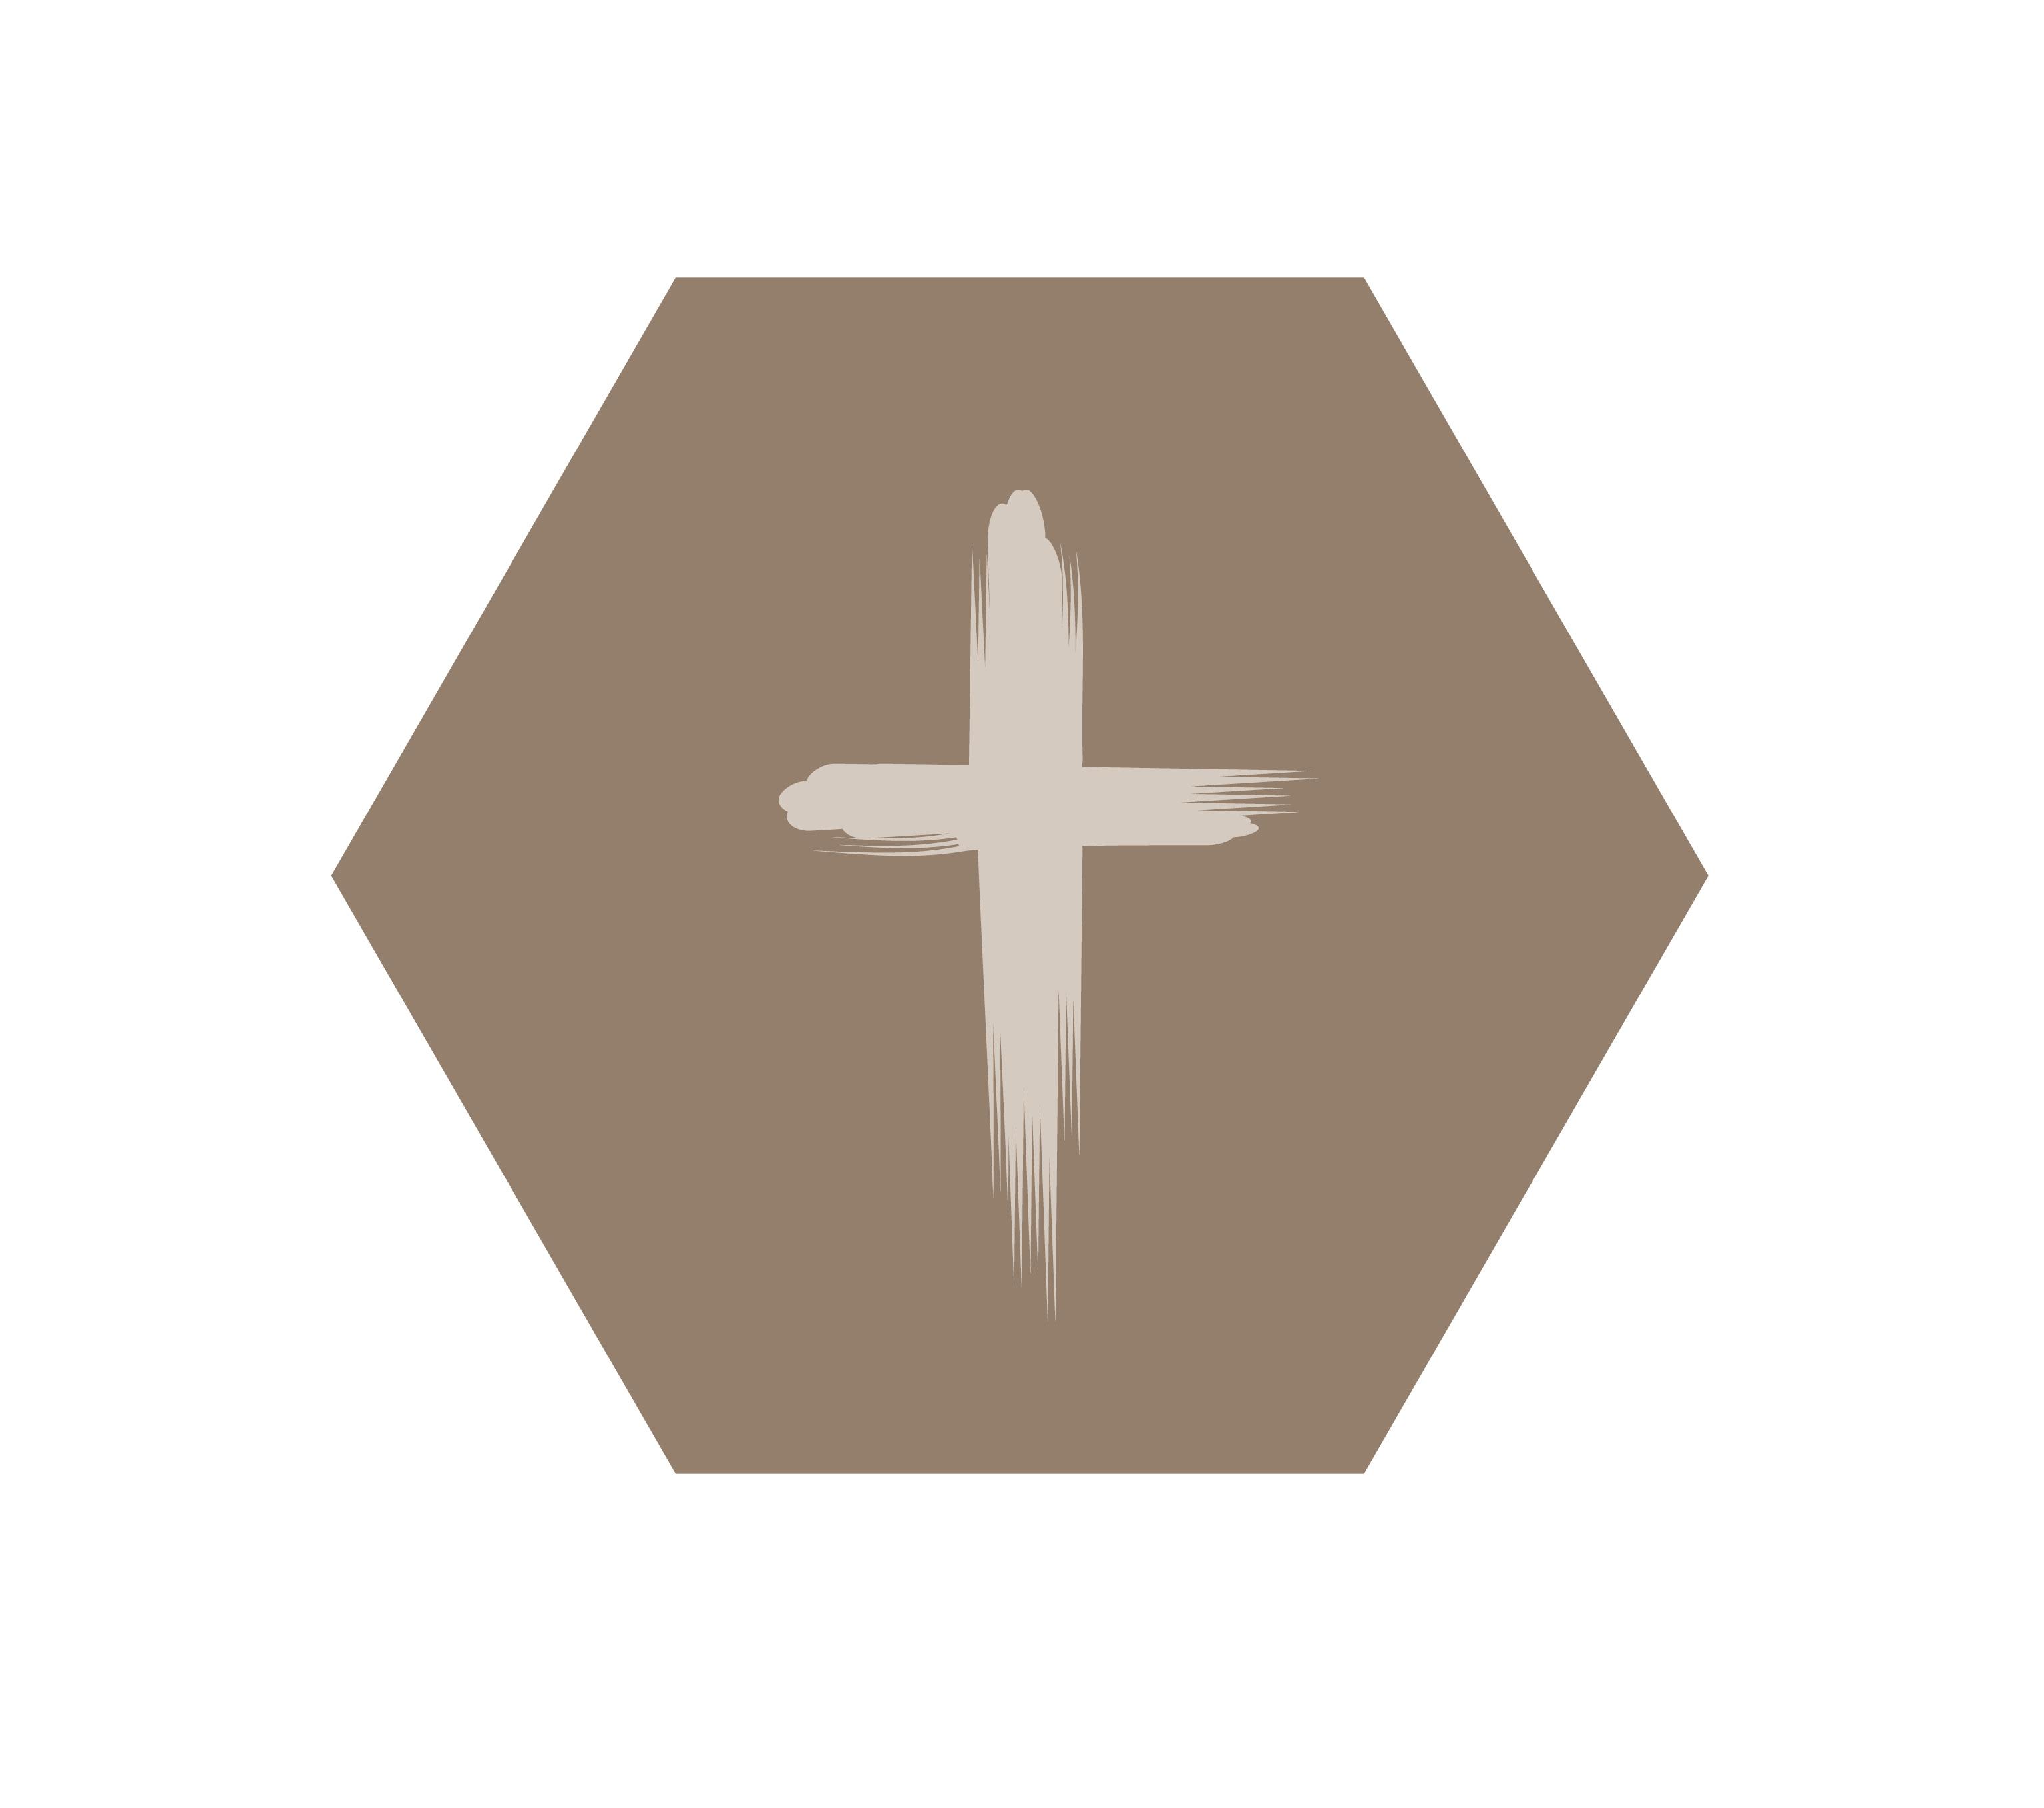 Muurvorm-kruis